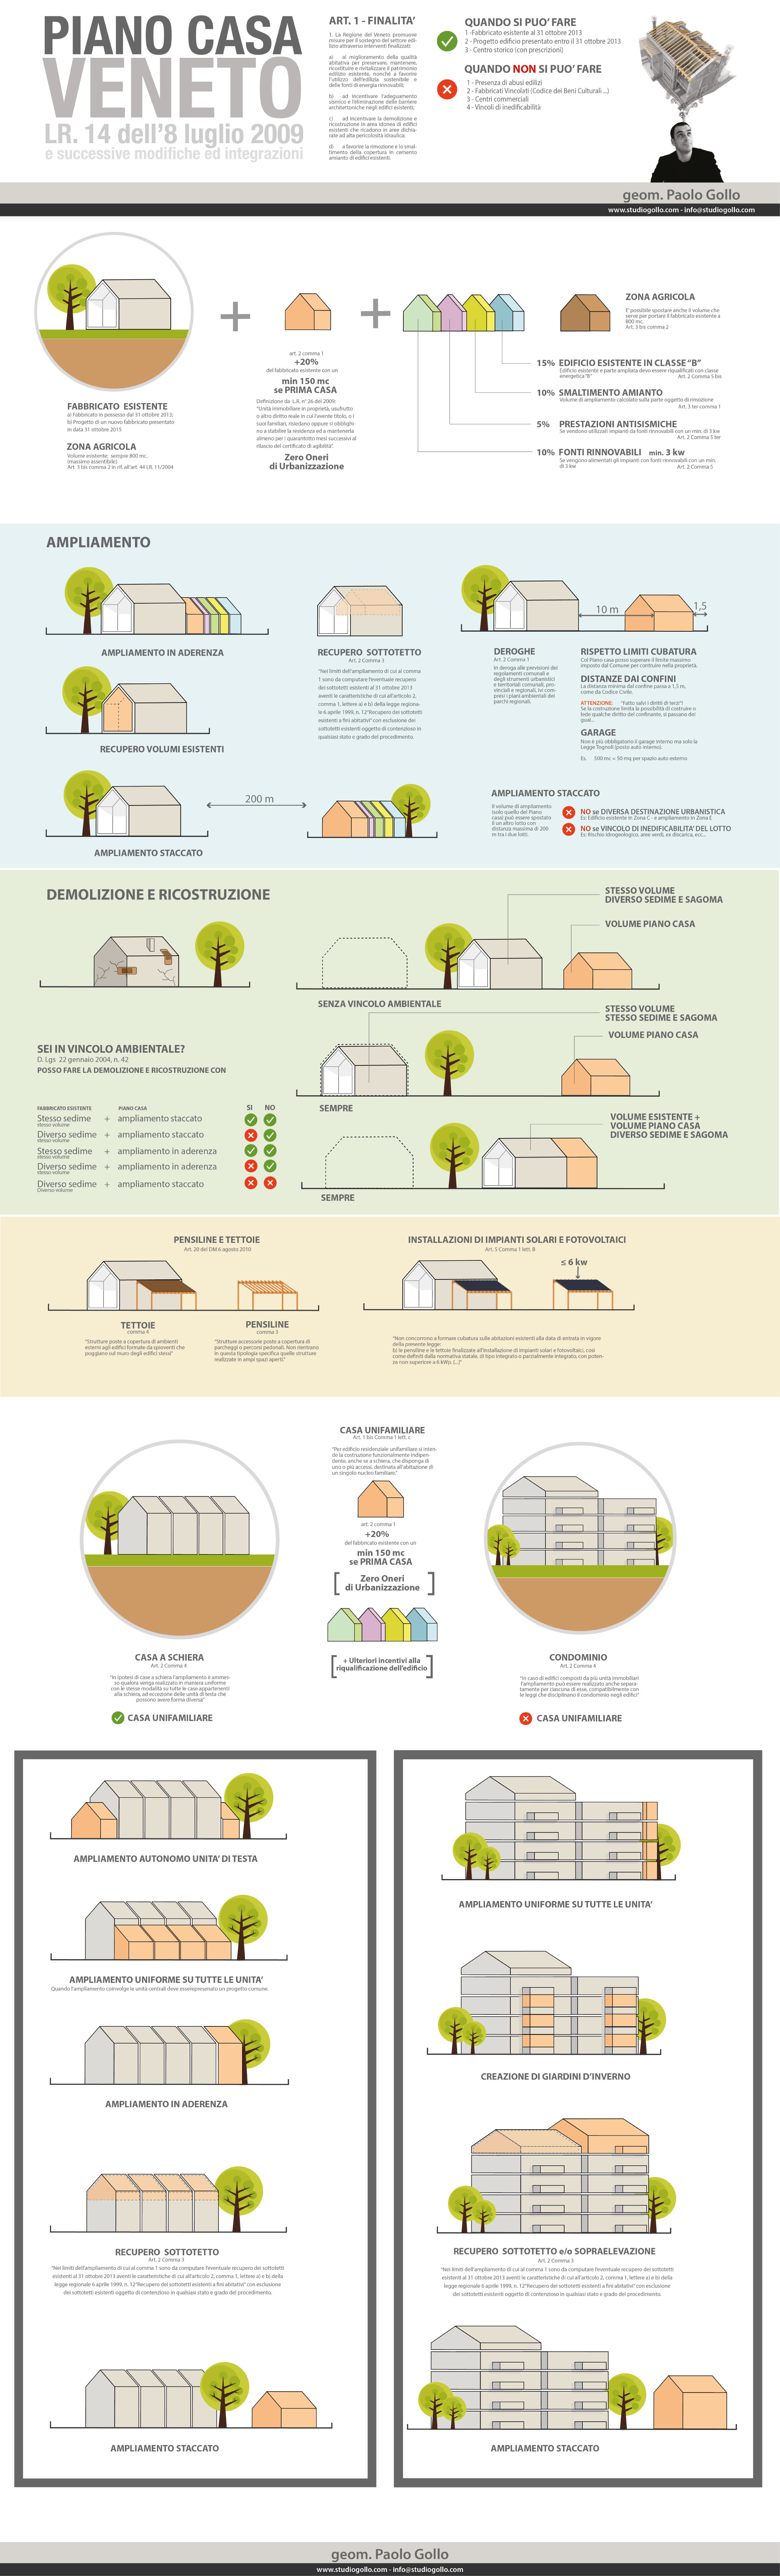 Infografica Piano Casa Veneto - LR 14/2009   Architettura